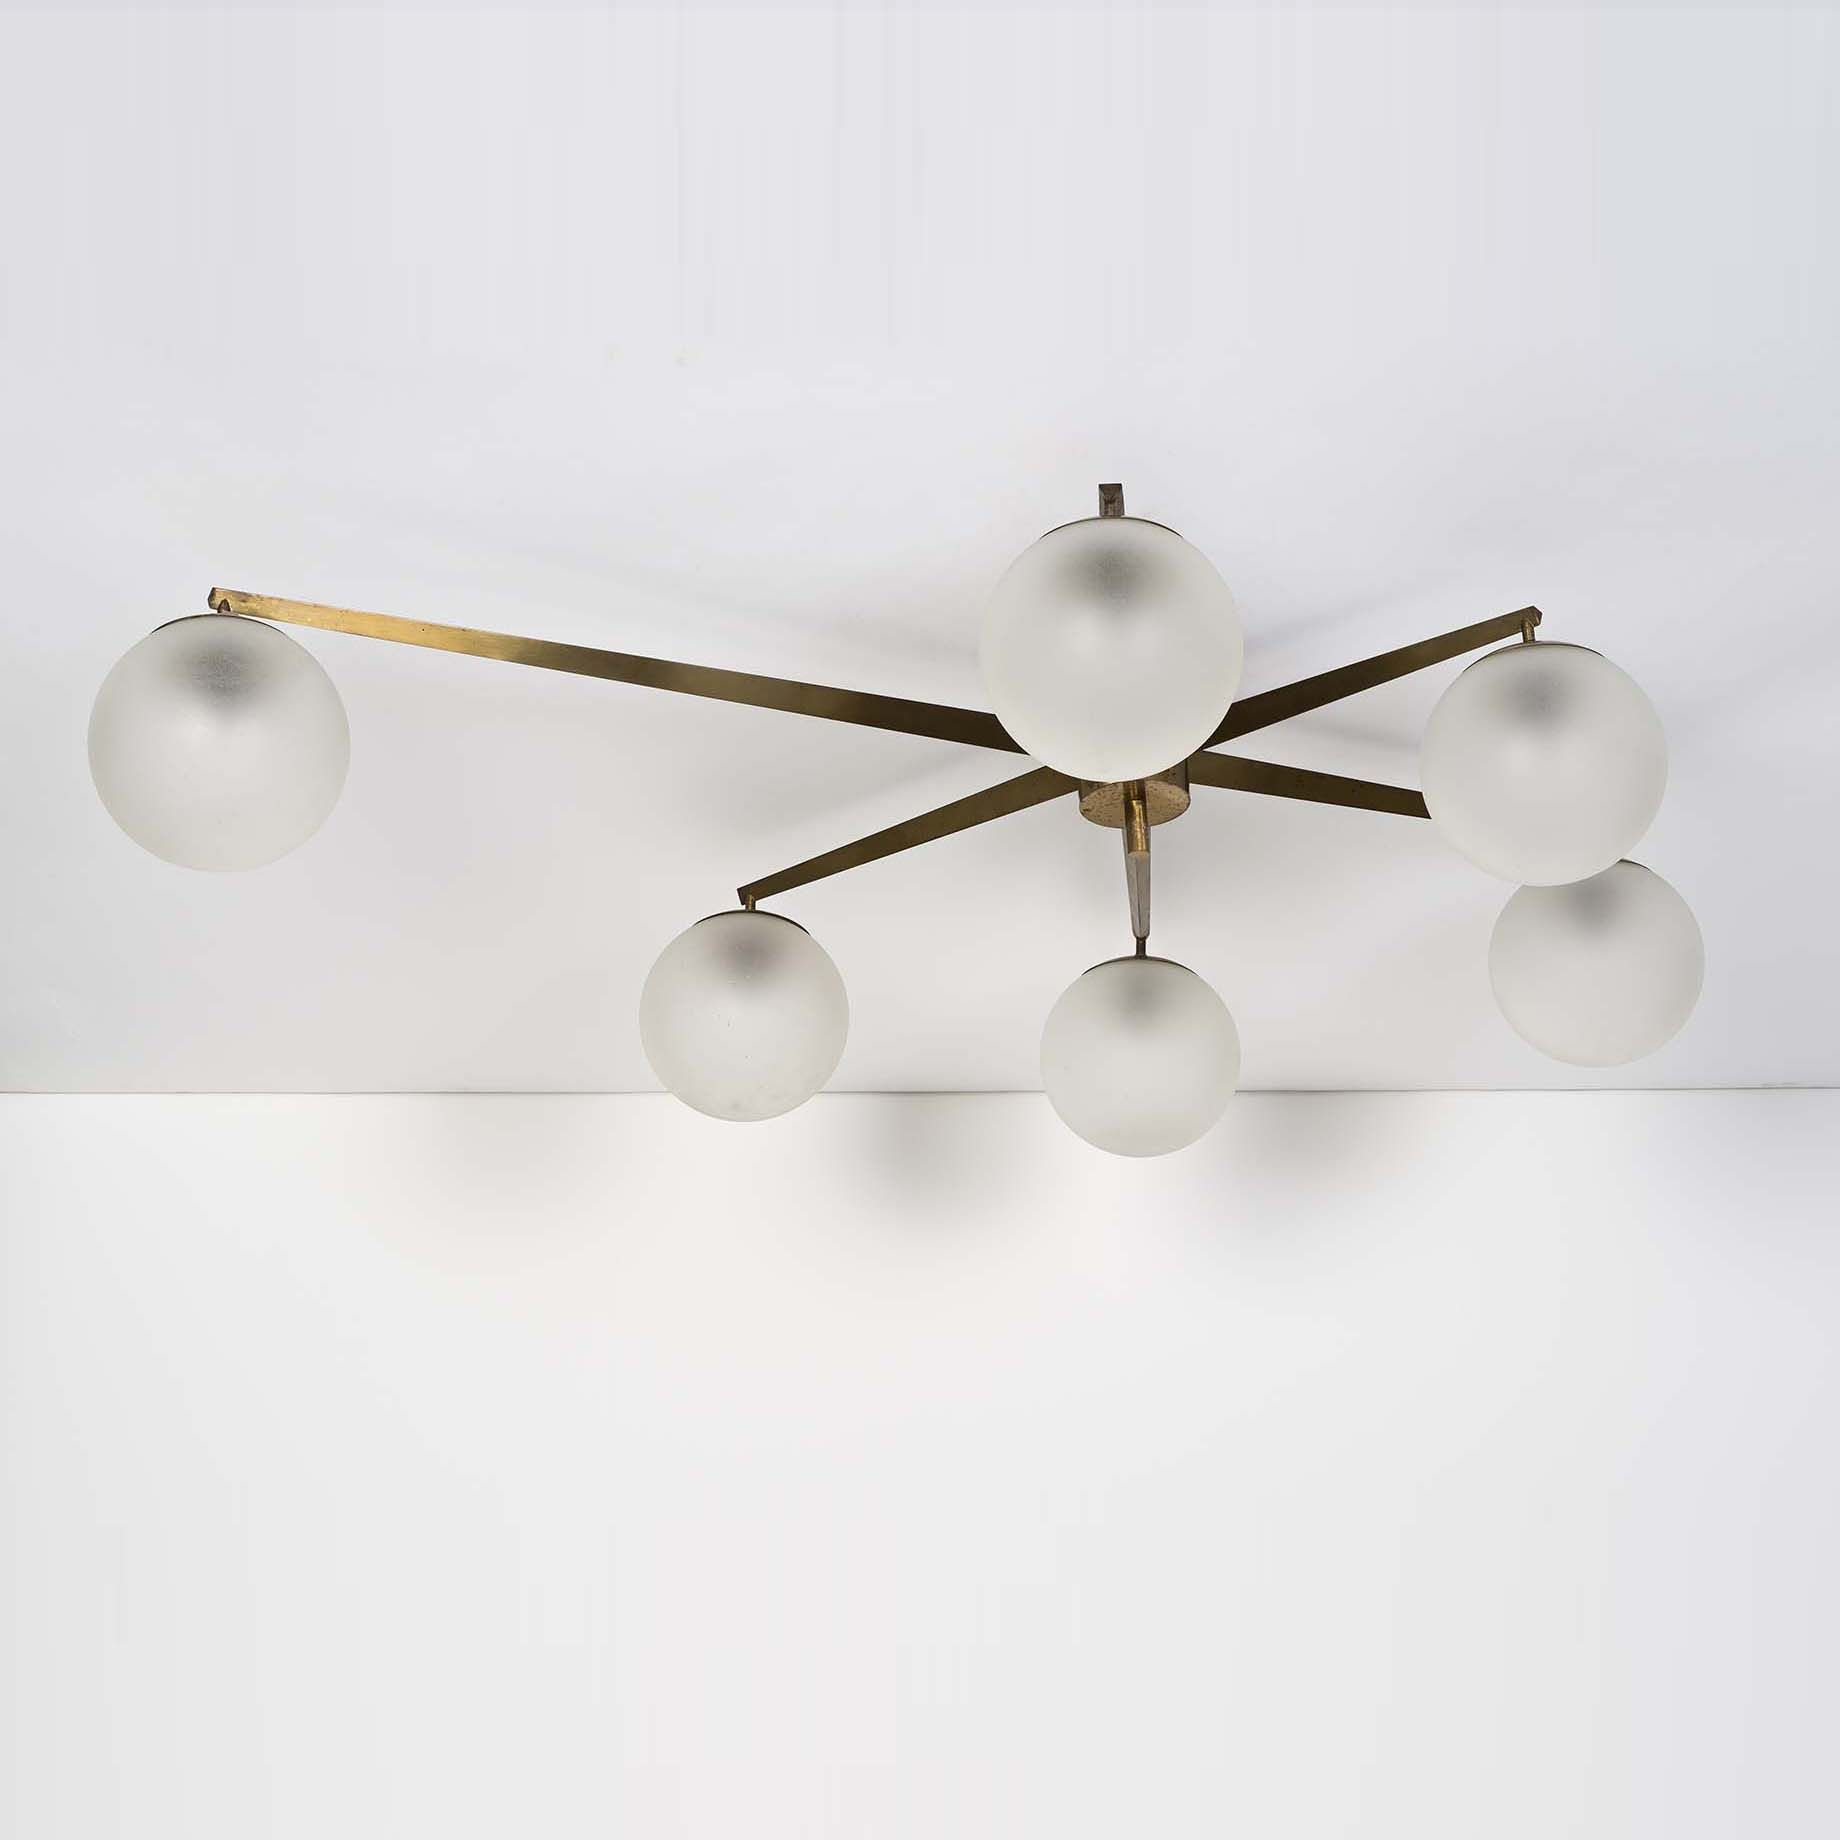 Angelo Lelli Brass and Opaline Ceiling Light for Arredoluce 1958